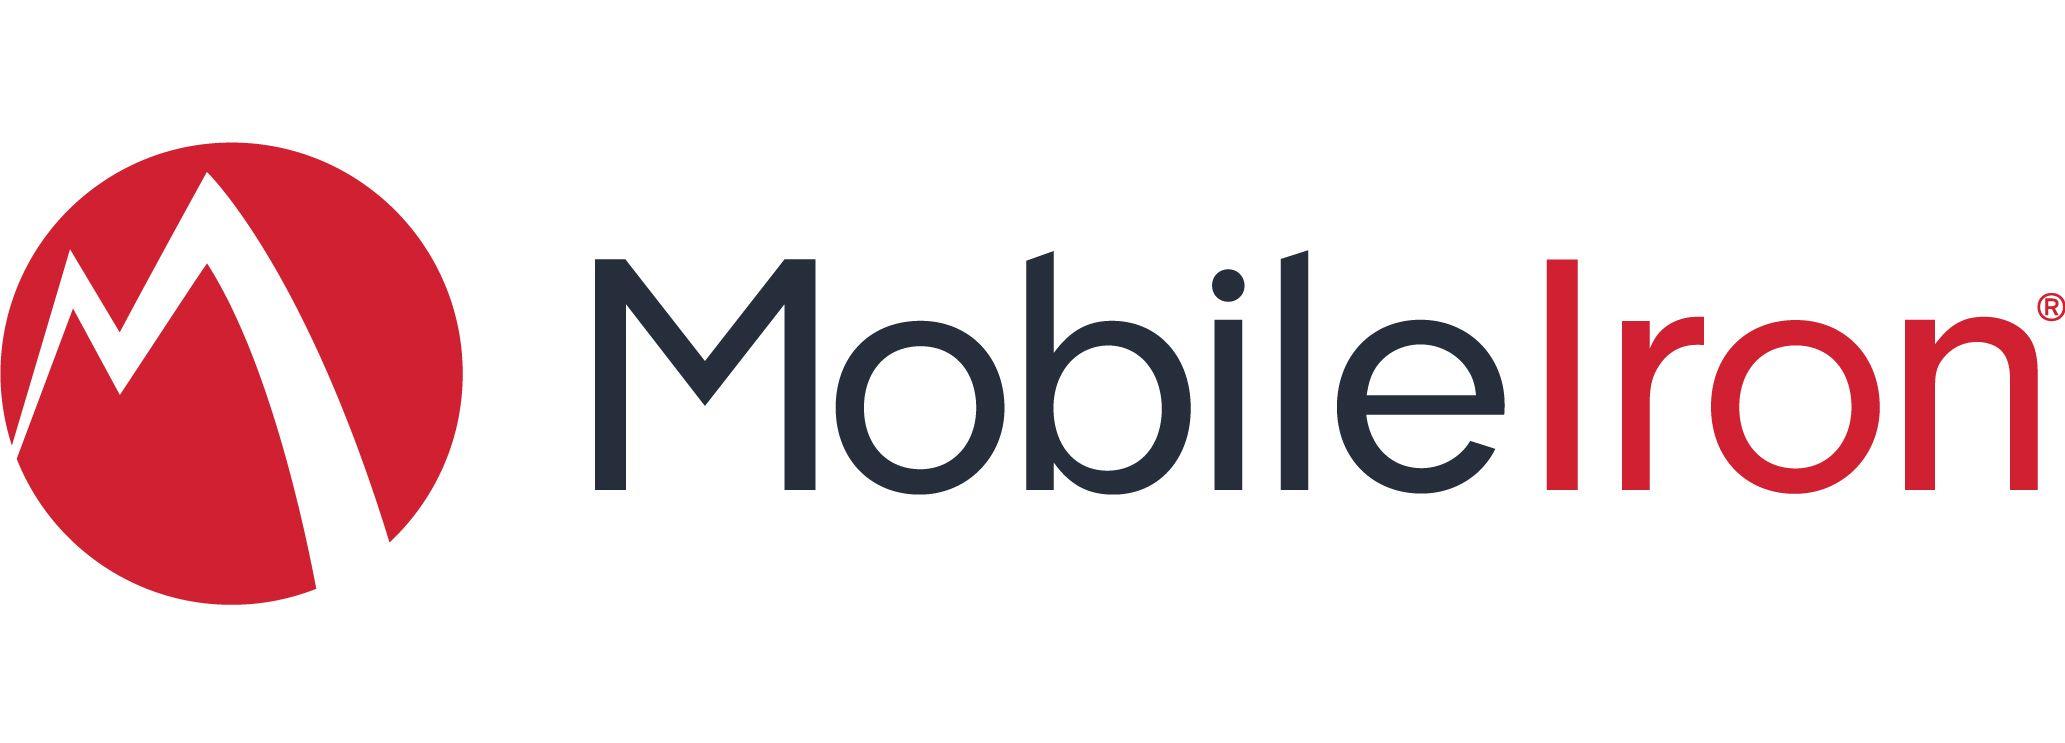 MobileIron anuncia su compatibilidad con Android for Work